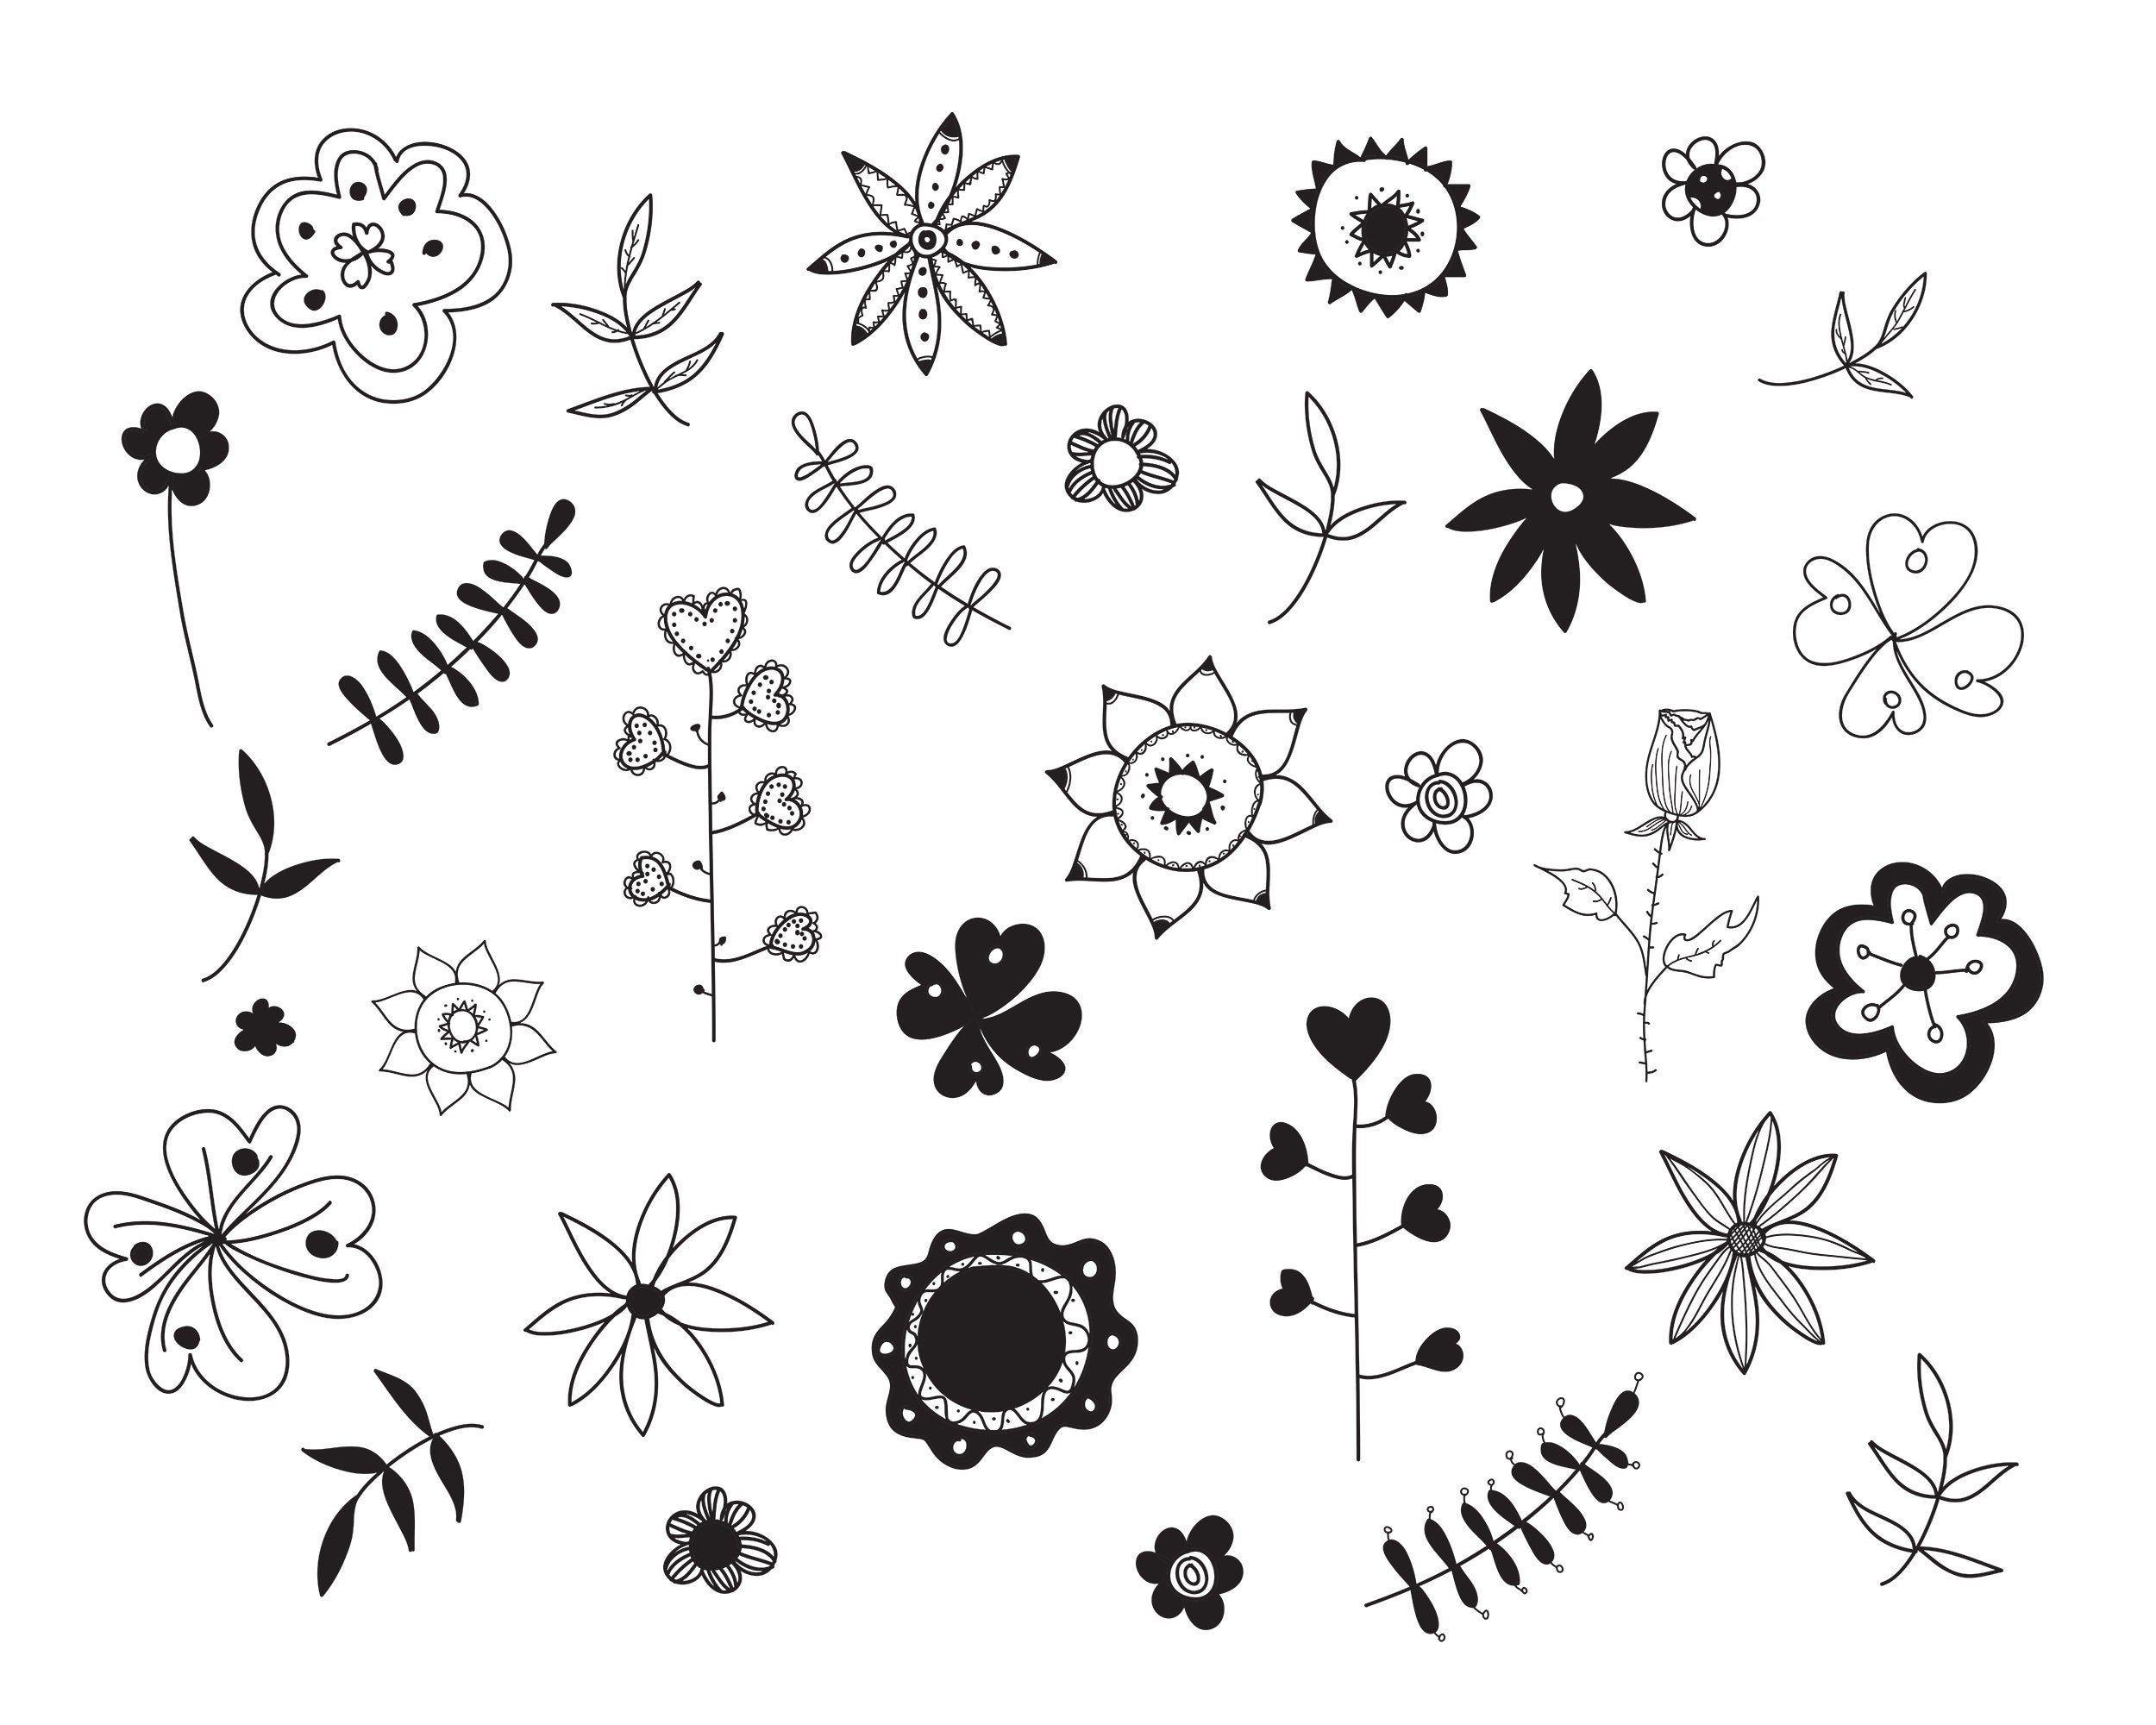 Floral Doodle Svg And Png Flower Doodle For Small Commercial Etsy Flower Doodles Floral Doodle Hand Drawn Flowers